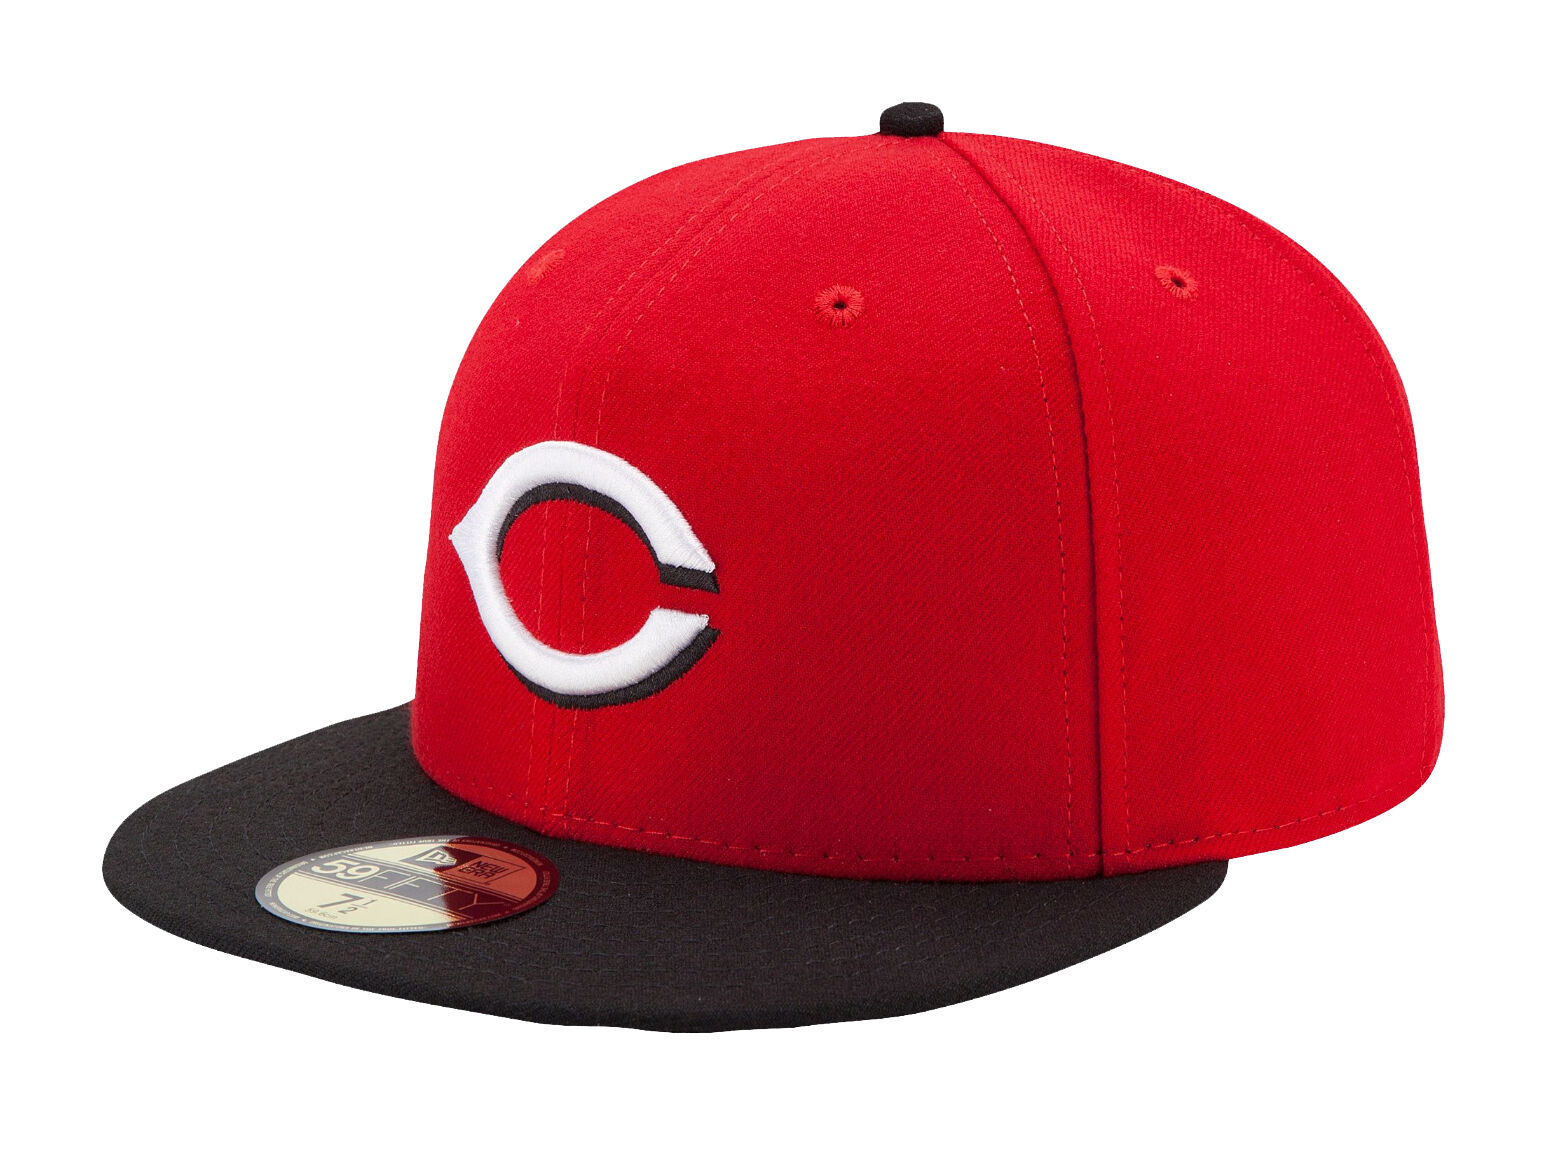 New Era Reds 59Fifty MLB Cap Cincinnati Reds Era AC On Field Fitted Road Hat 4a93c4